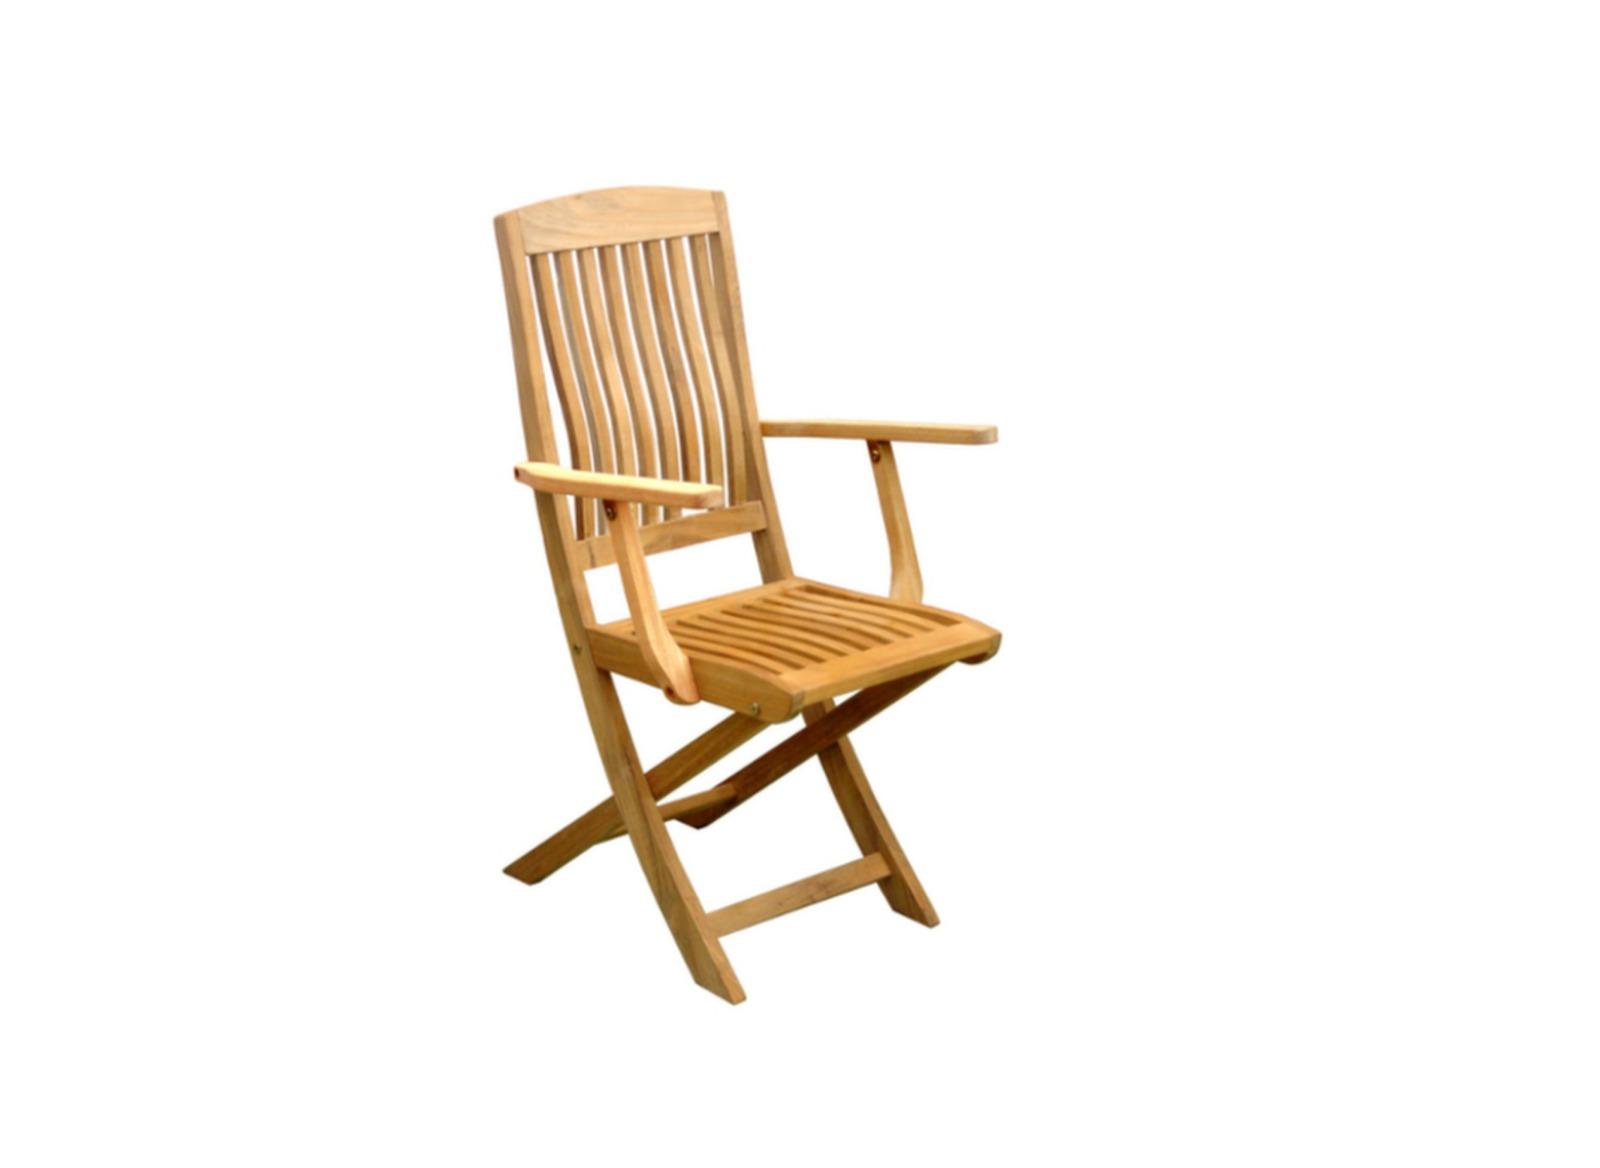 Chaise de jardin pliante en teck rias proloisirs - Chaise pliante teck ...